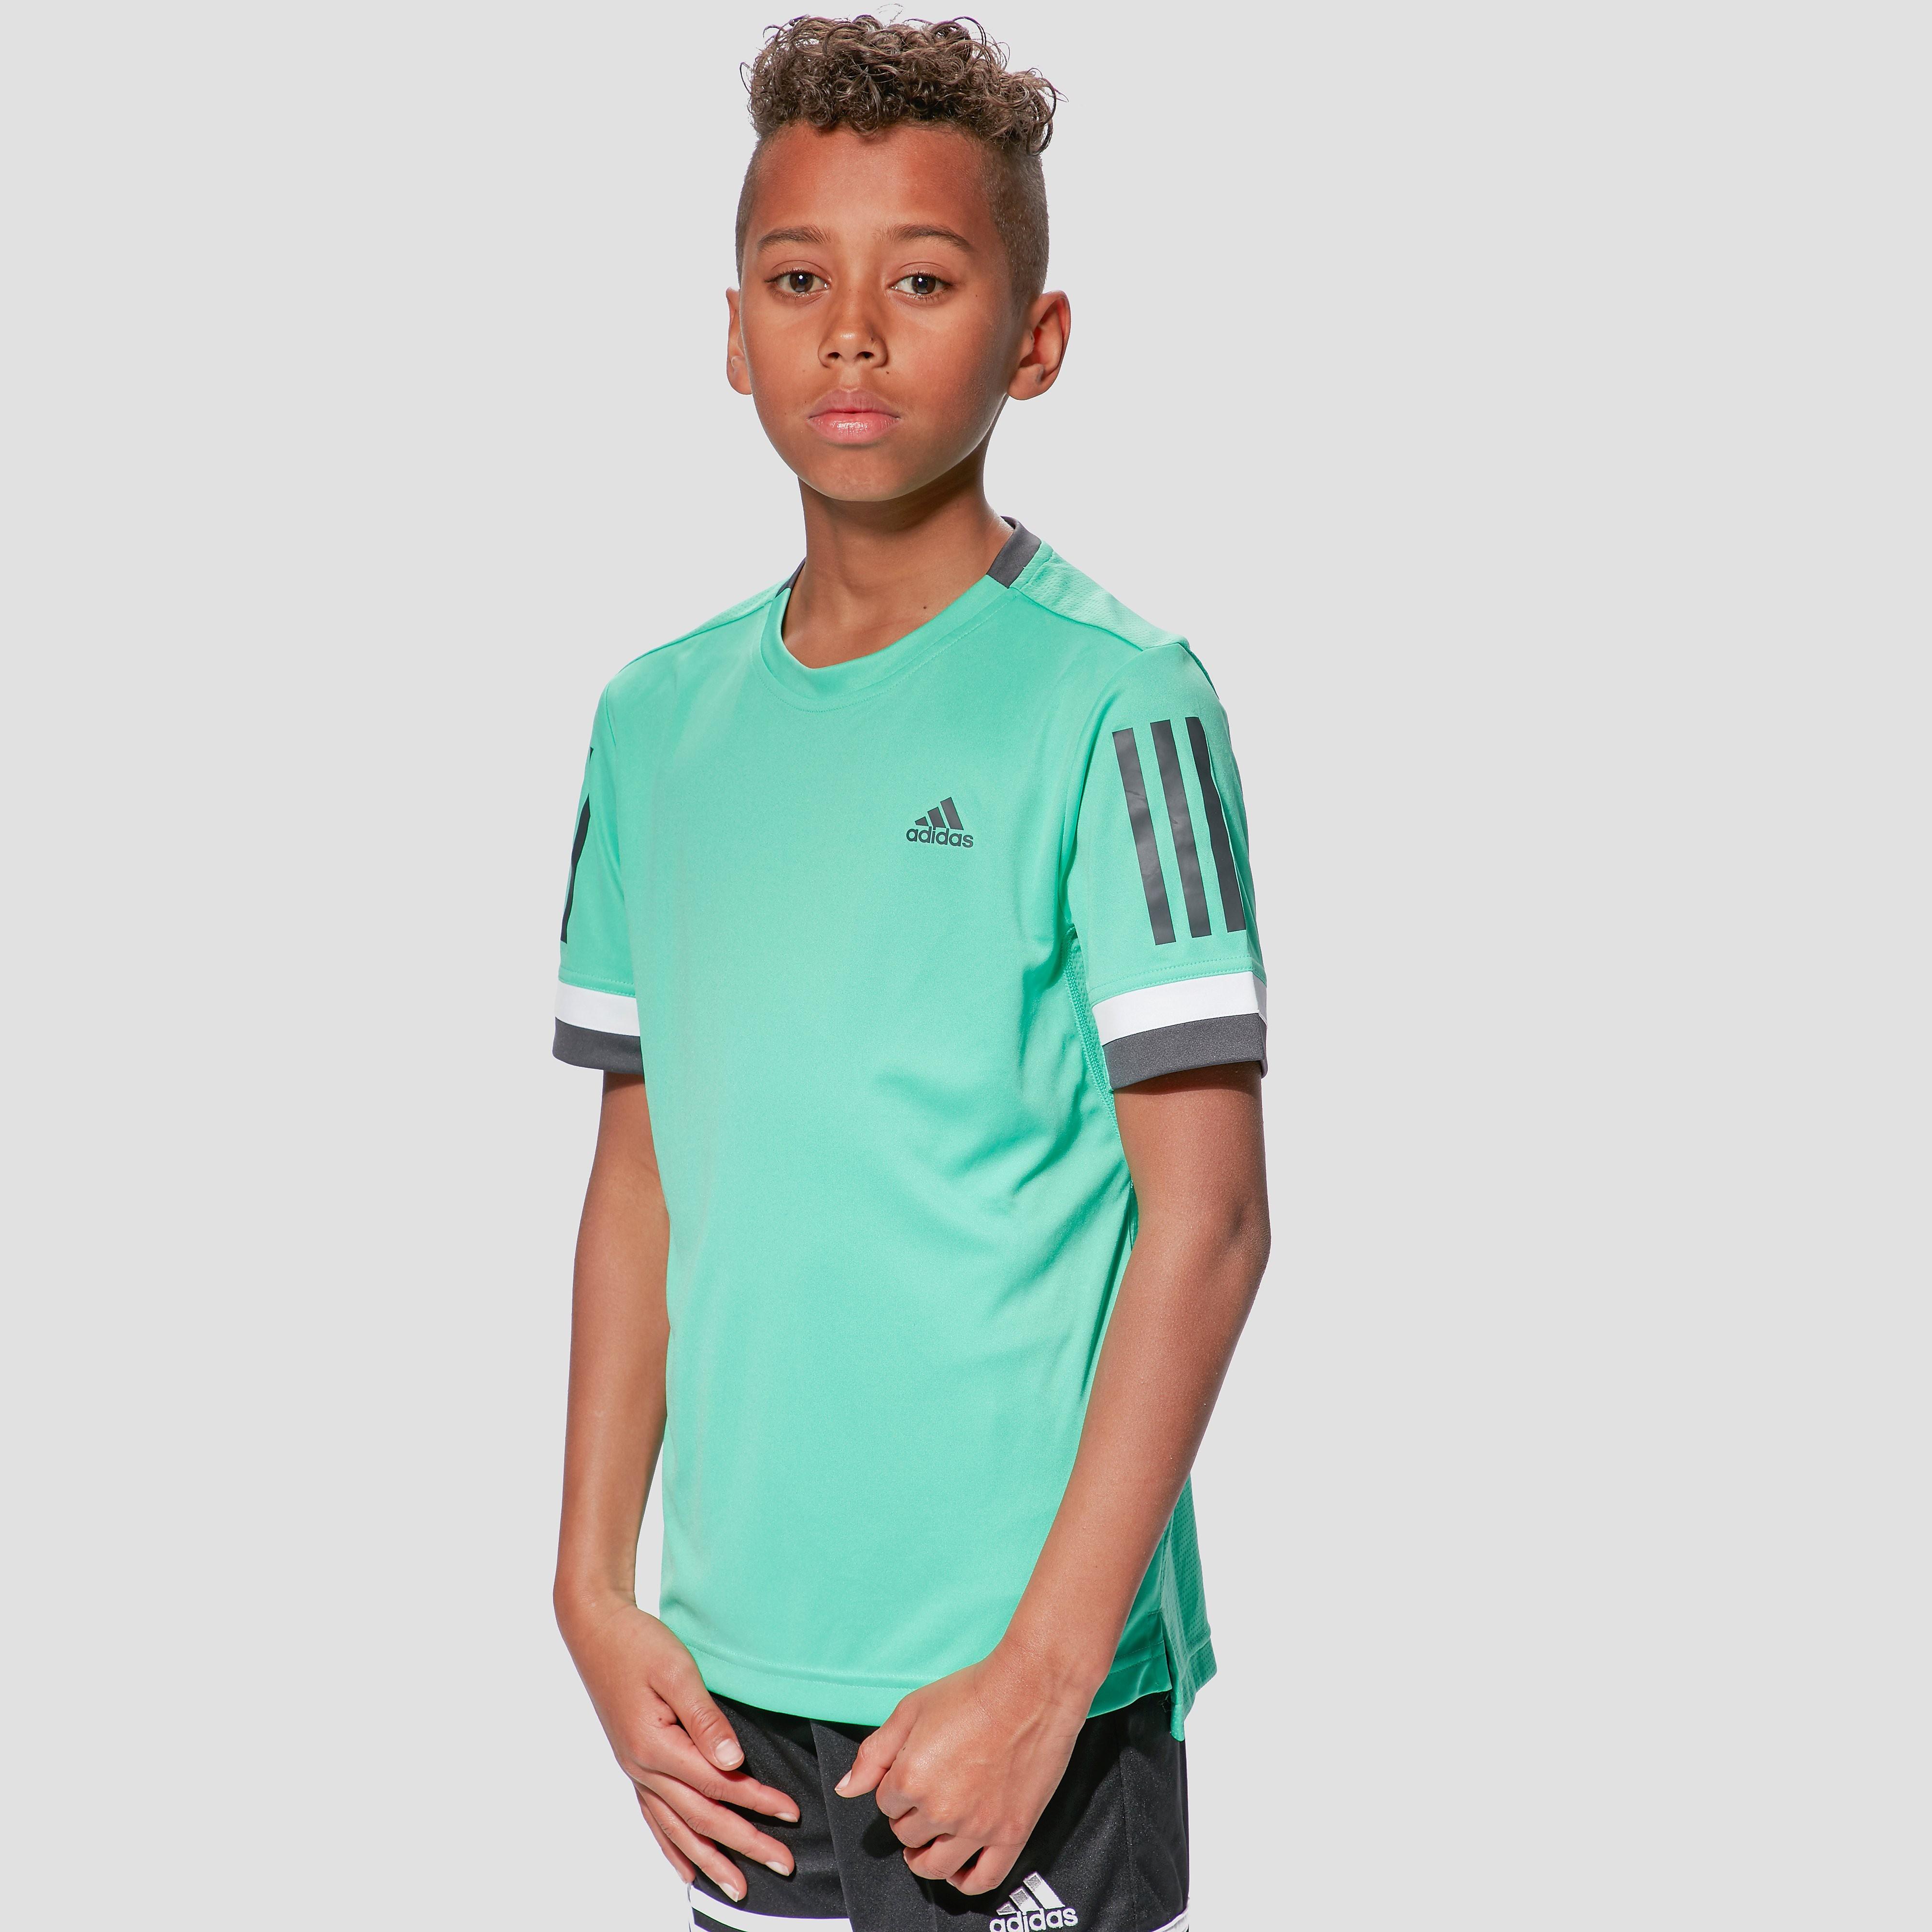 adidas Junior Club T-Shirt